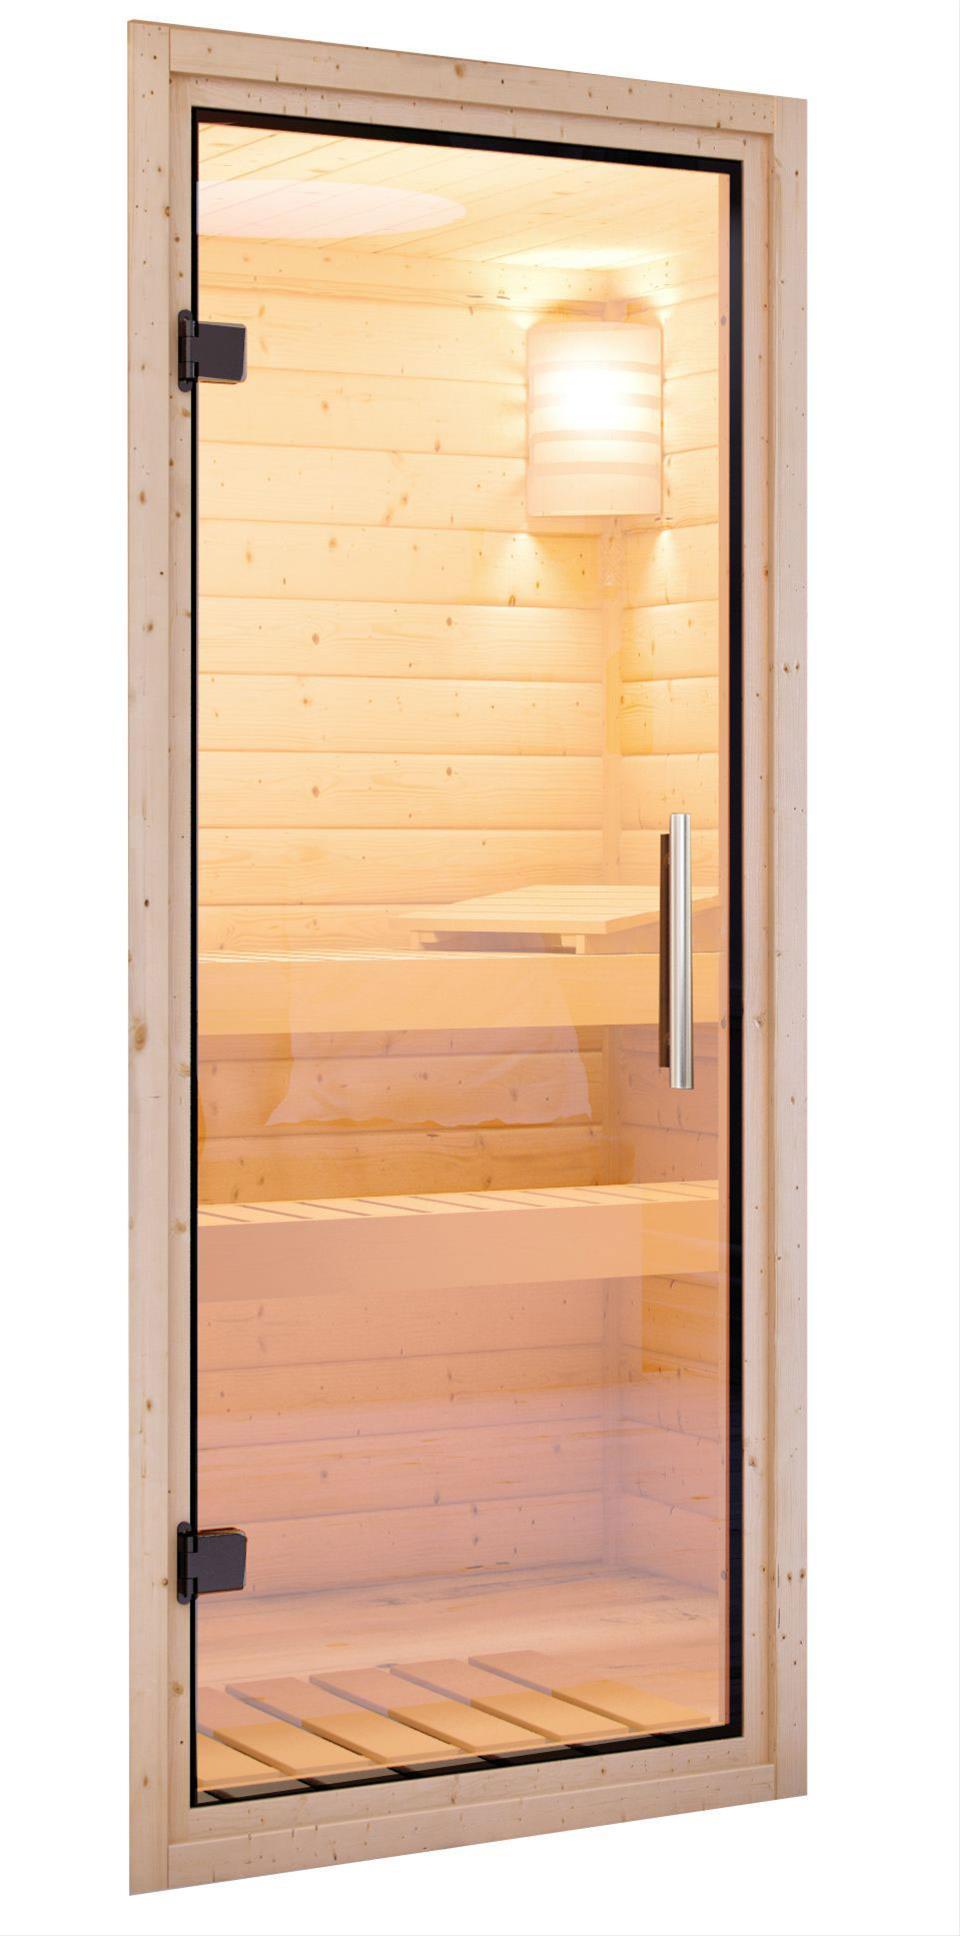 WoodFeeling Sauna Nina 38mm Bio Saunaofen 9kW ext. Kranz Klarglas Tür Bild 6